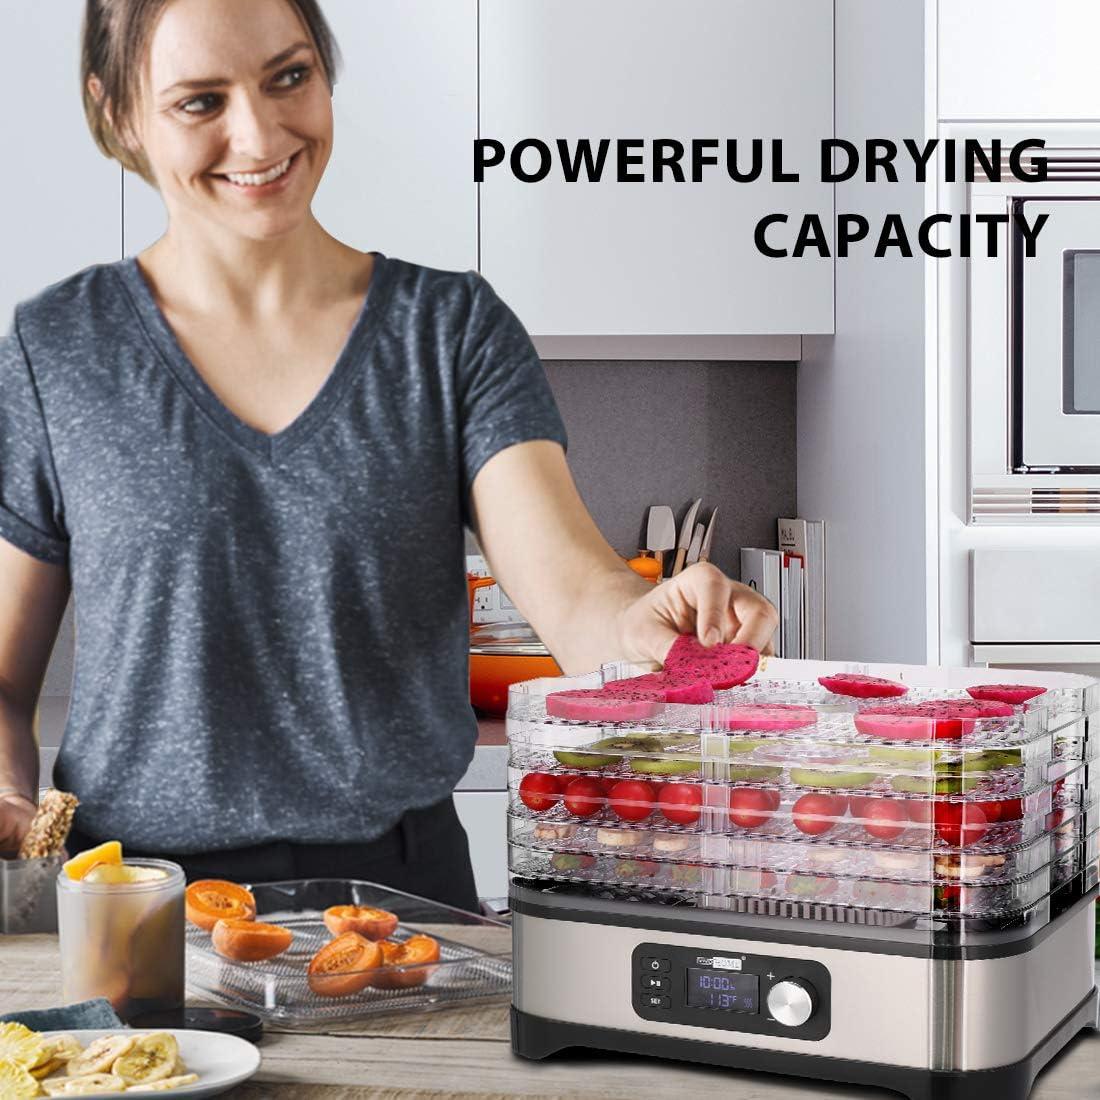 VIVOHOME-Electric-400W-5-Trays-Food-Dehydrating-Machine